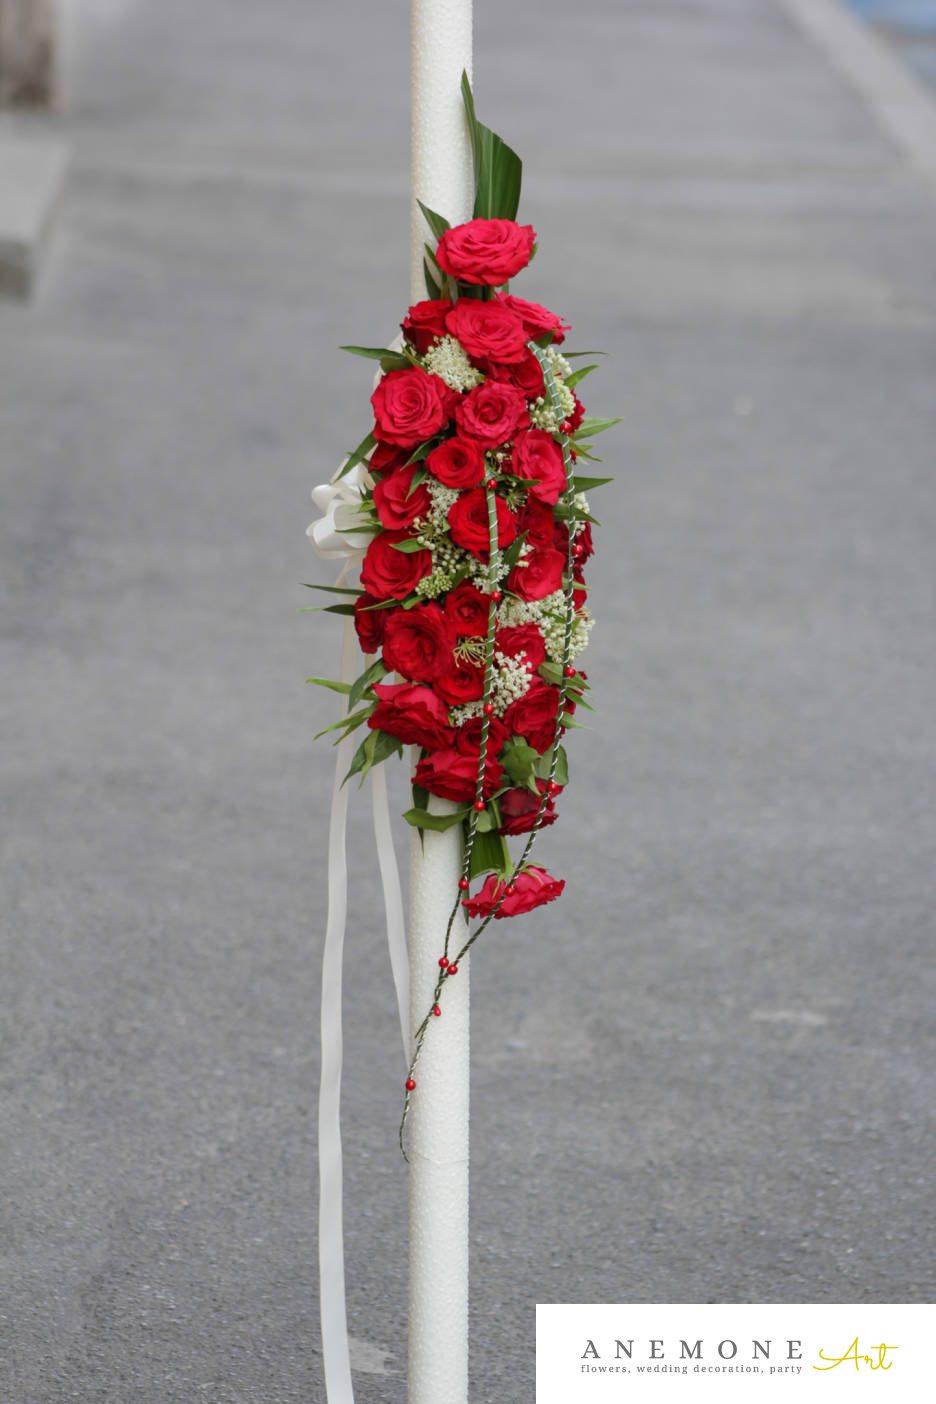 Poza, foto cu Flori de nunta alb, gipsofila, lumanare cununie, perle, rosu, trandafiri in Arad, Timisoara, Oradea (wedding flowers, bouquets) nunta Arad, Timisoara, Oradea